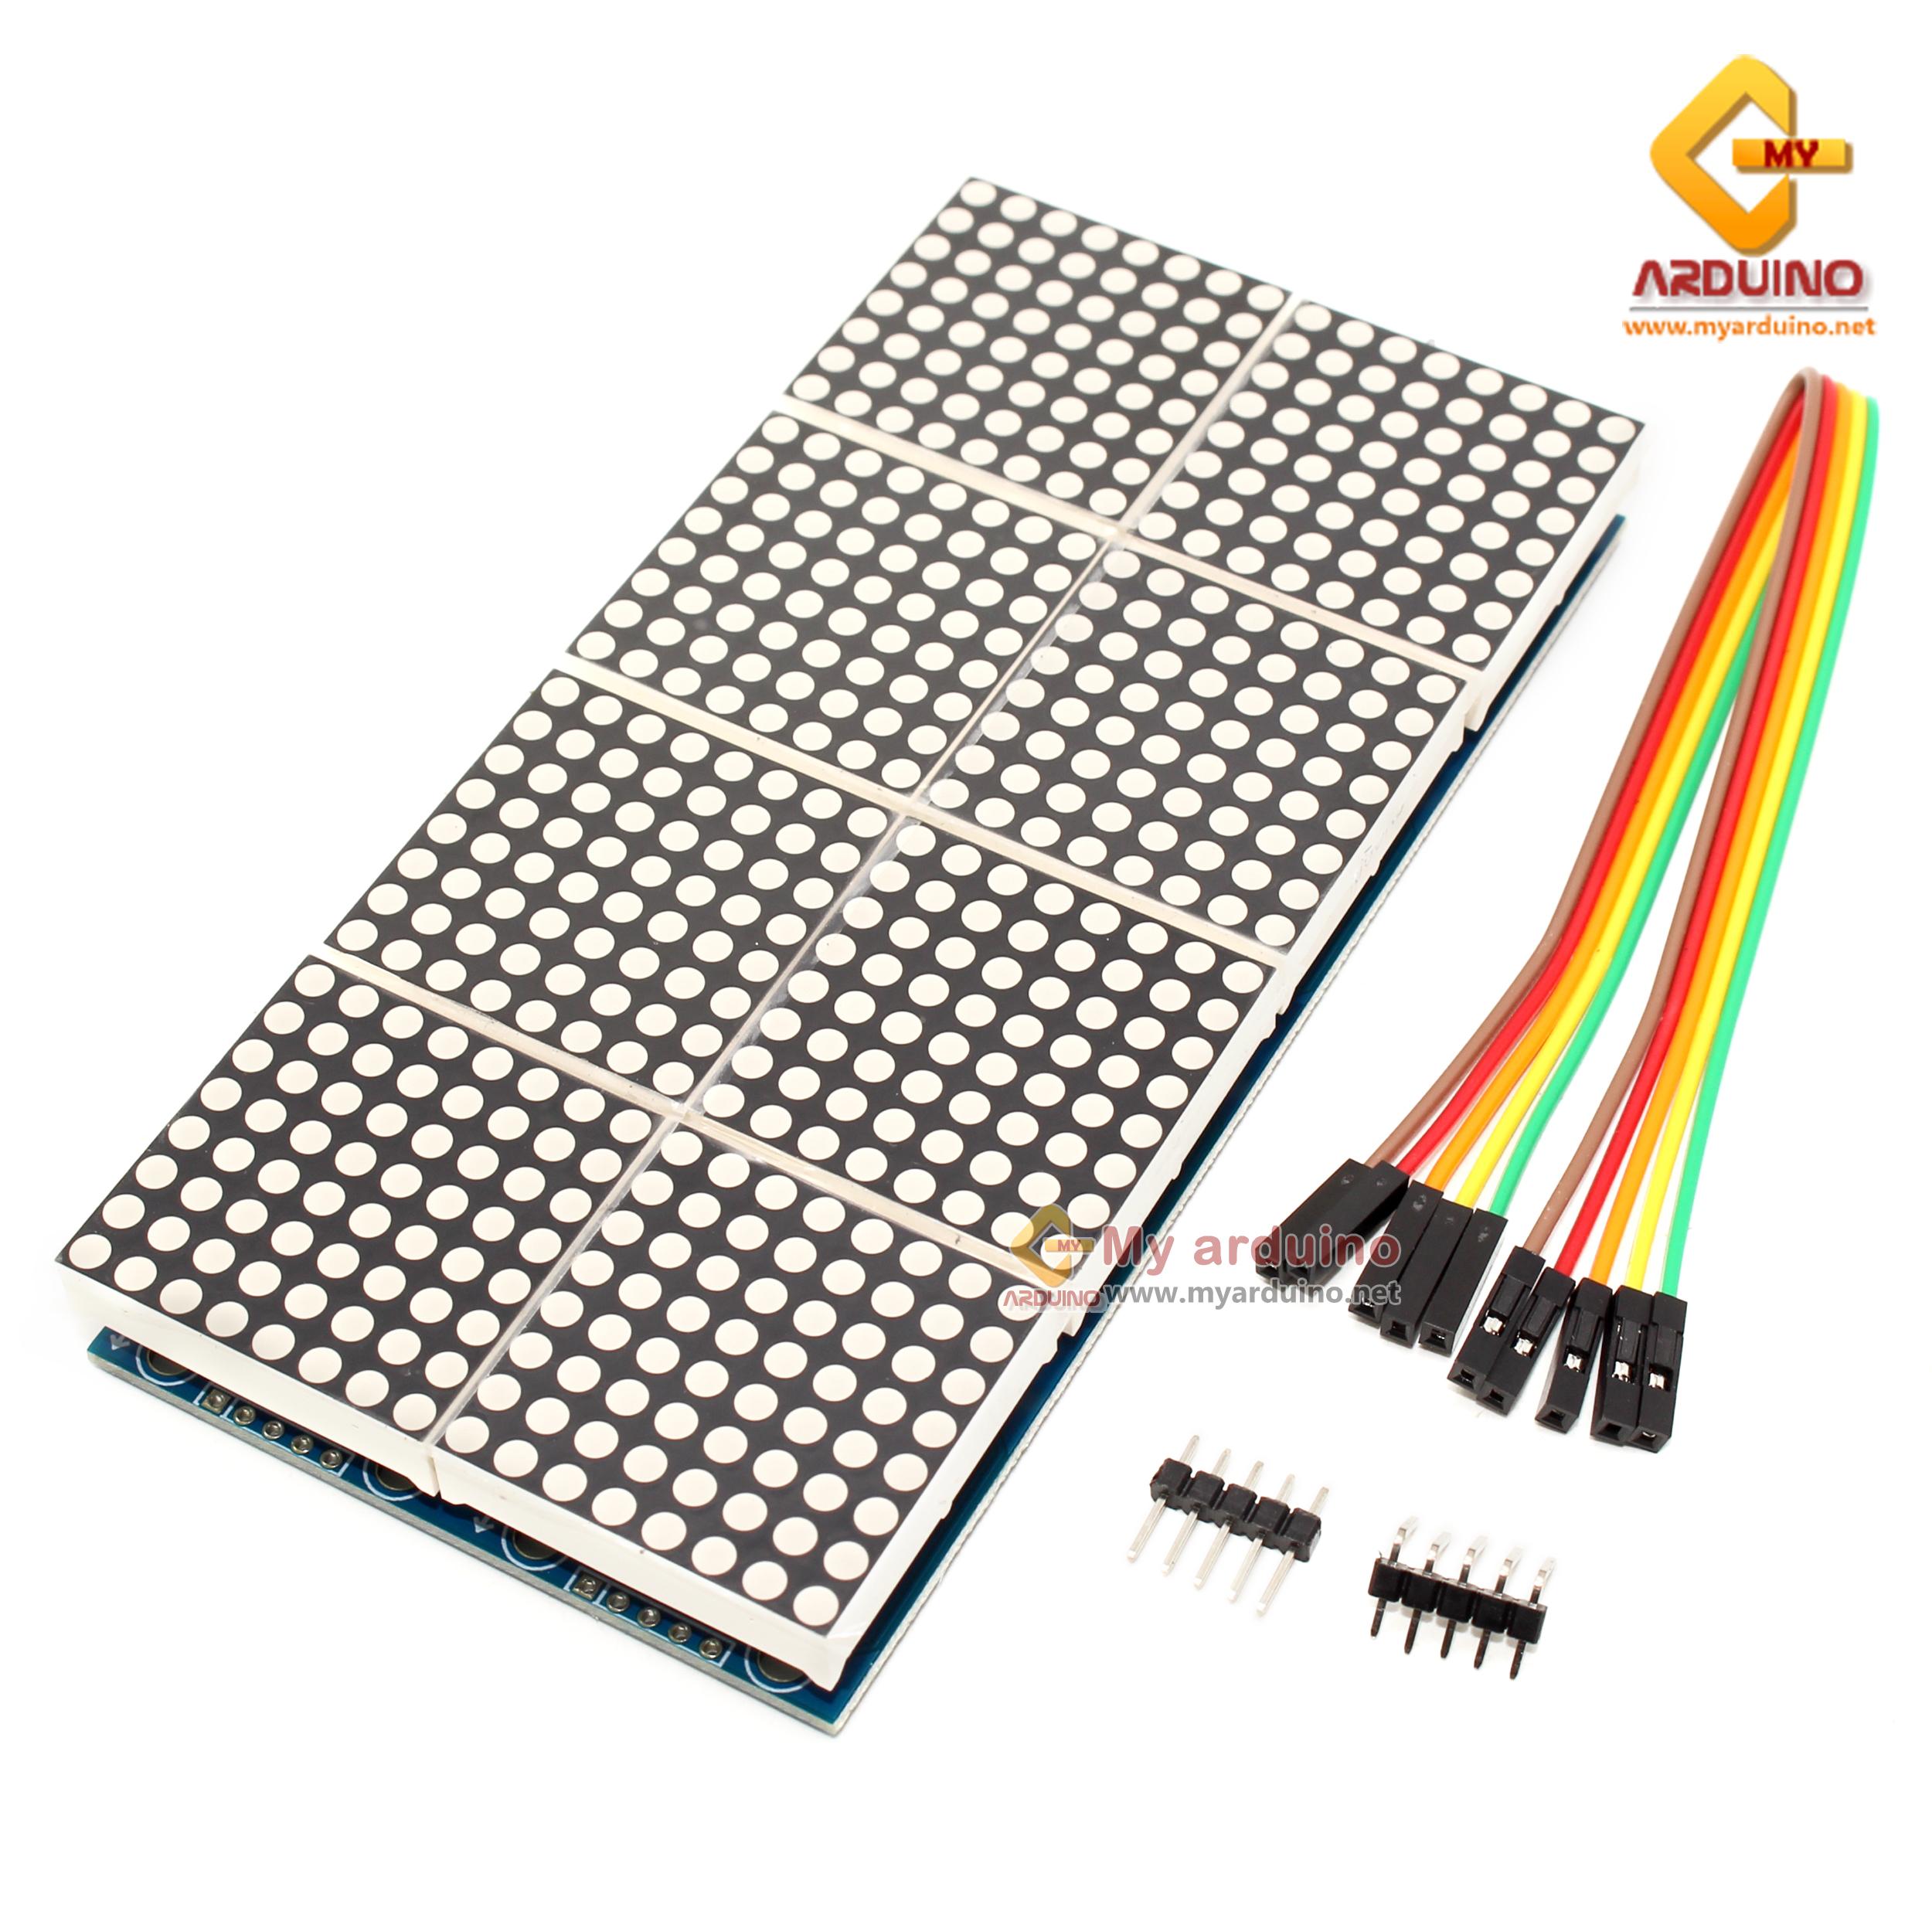 LED Matrix Driver MAX7219 IC Driver Module + LED Dot Matrix 8x8 ขนาด 32mm x  32mm 8 ชุด 2แถว สีแดง